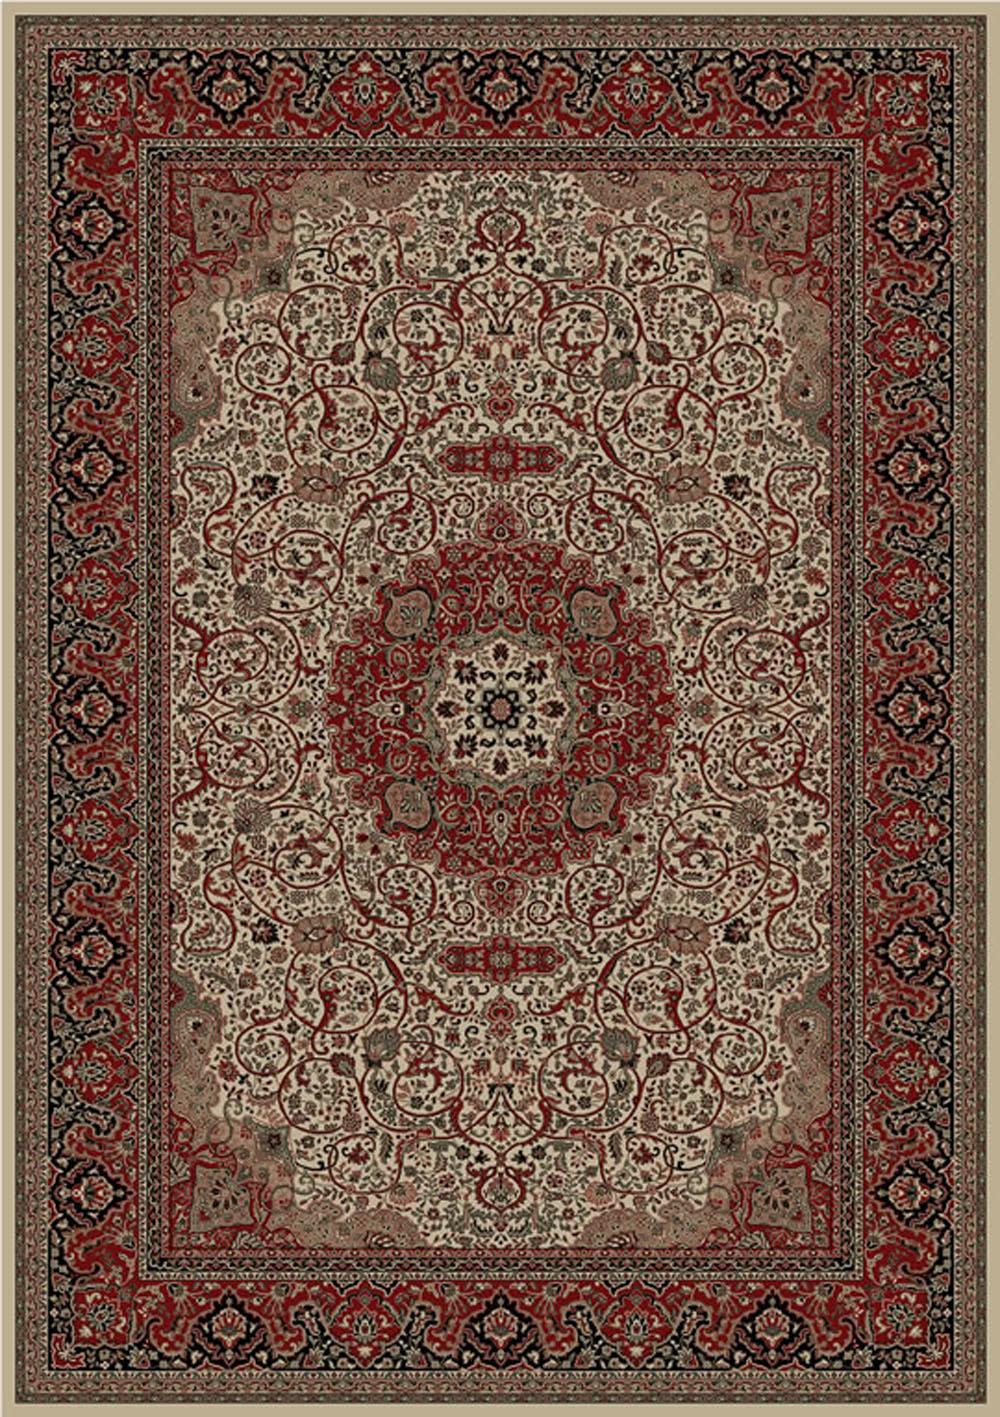 Concord Global Persian Classics ISFAHAN IVORY Rug